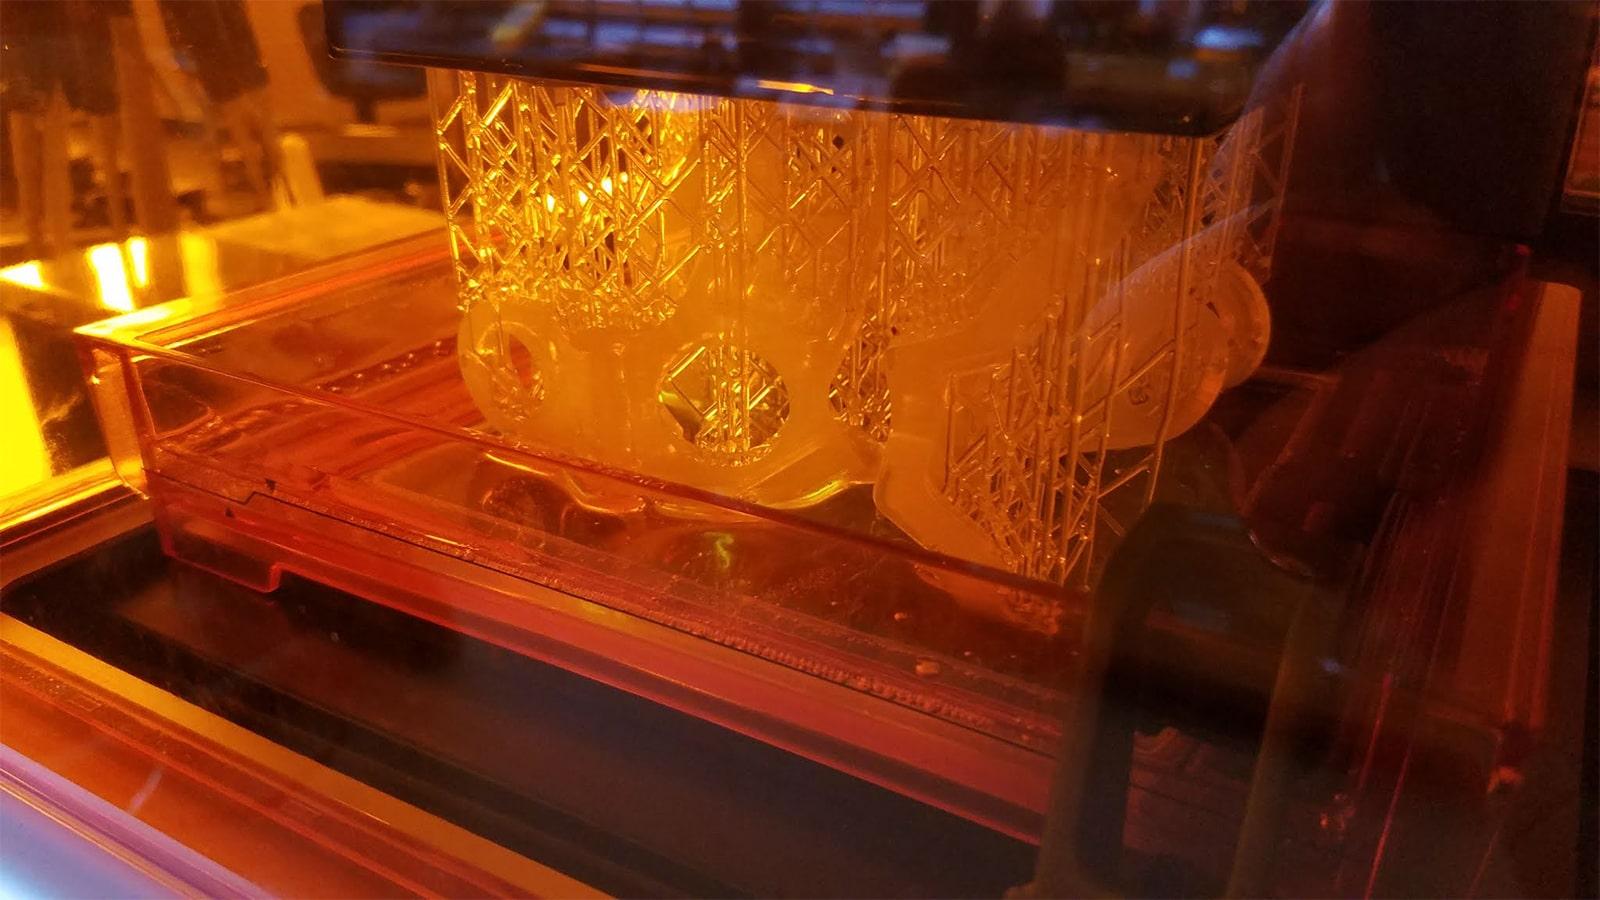 An image of something being 3D printed through Vame